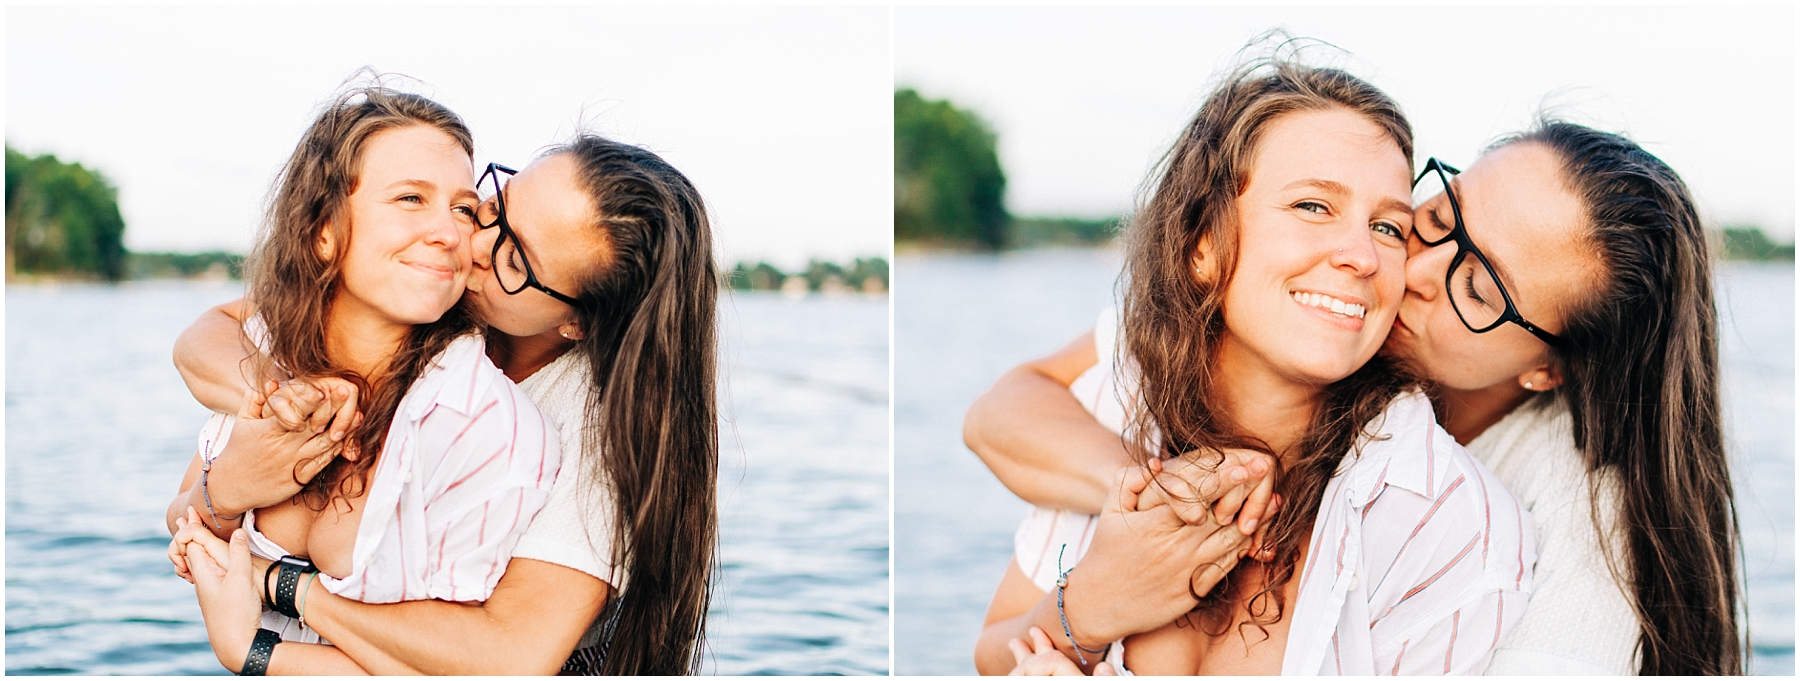 west lafayette indiana engagement wedding photographer purdue alumni engagement photogrpahy chelsea and kylee engagement_0260.jpg